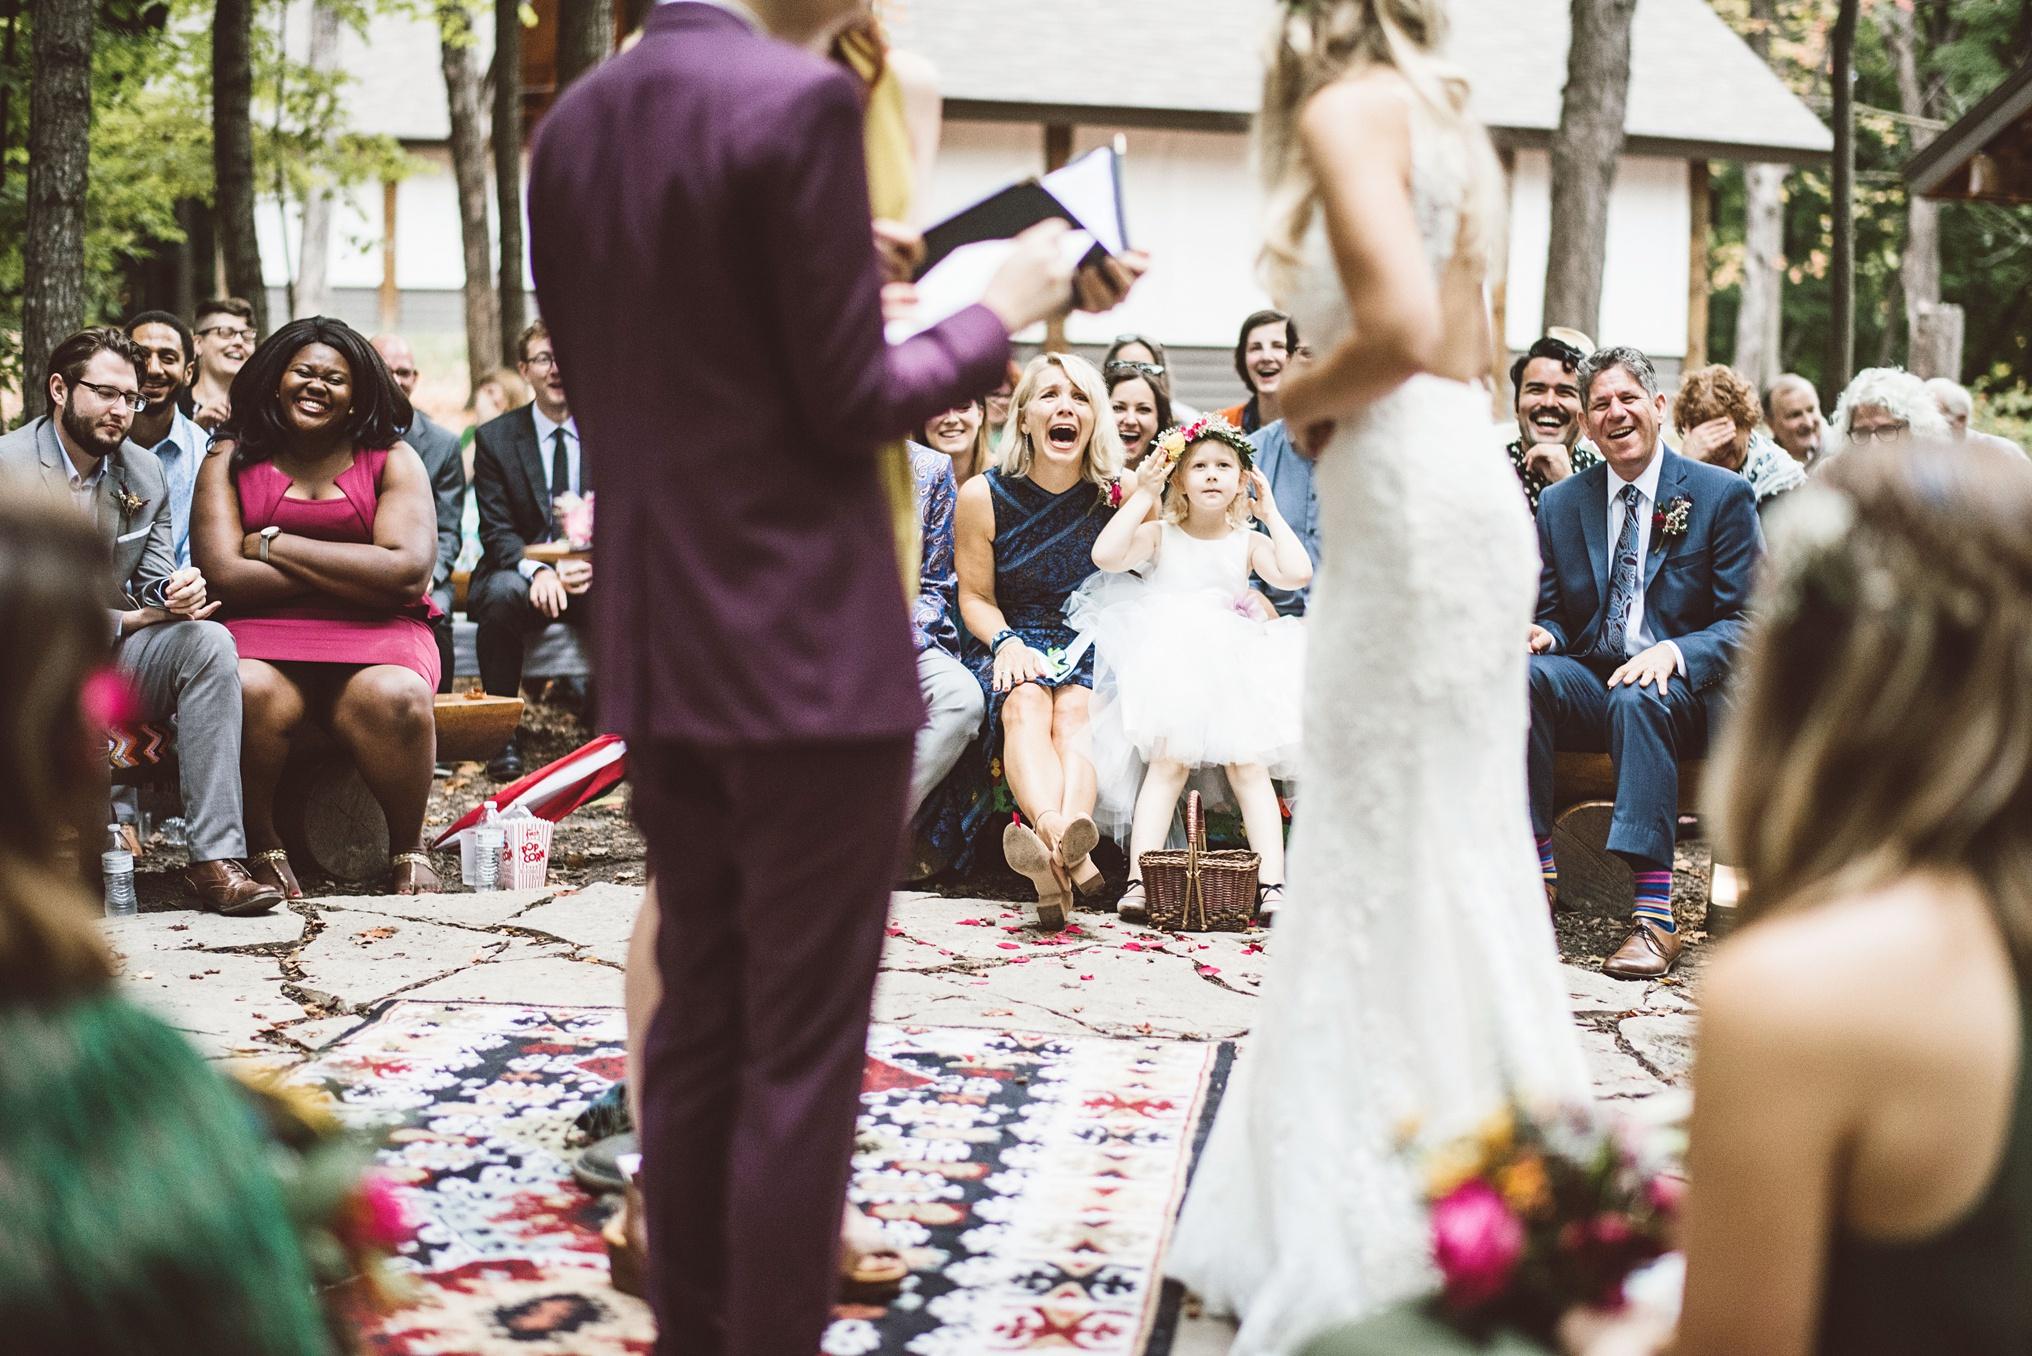 best_wedding_photography_2017_by_lucas_botz_photography_034.jpg